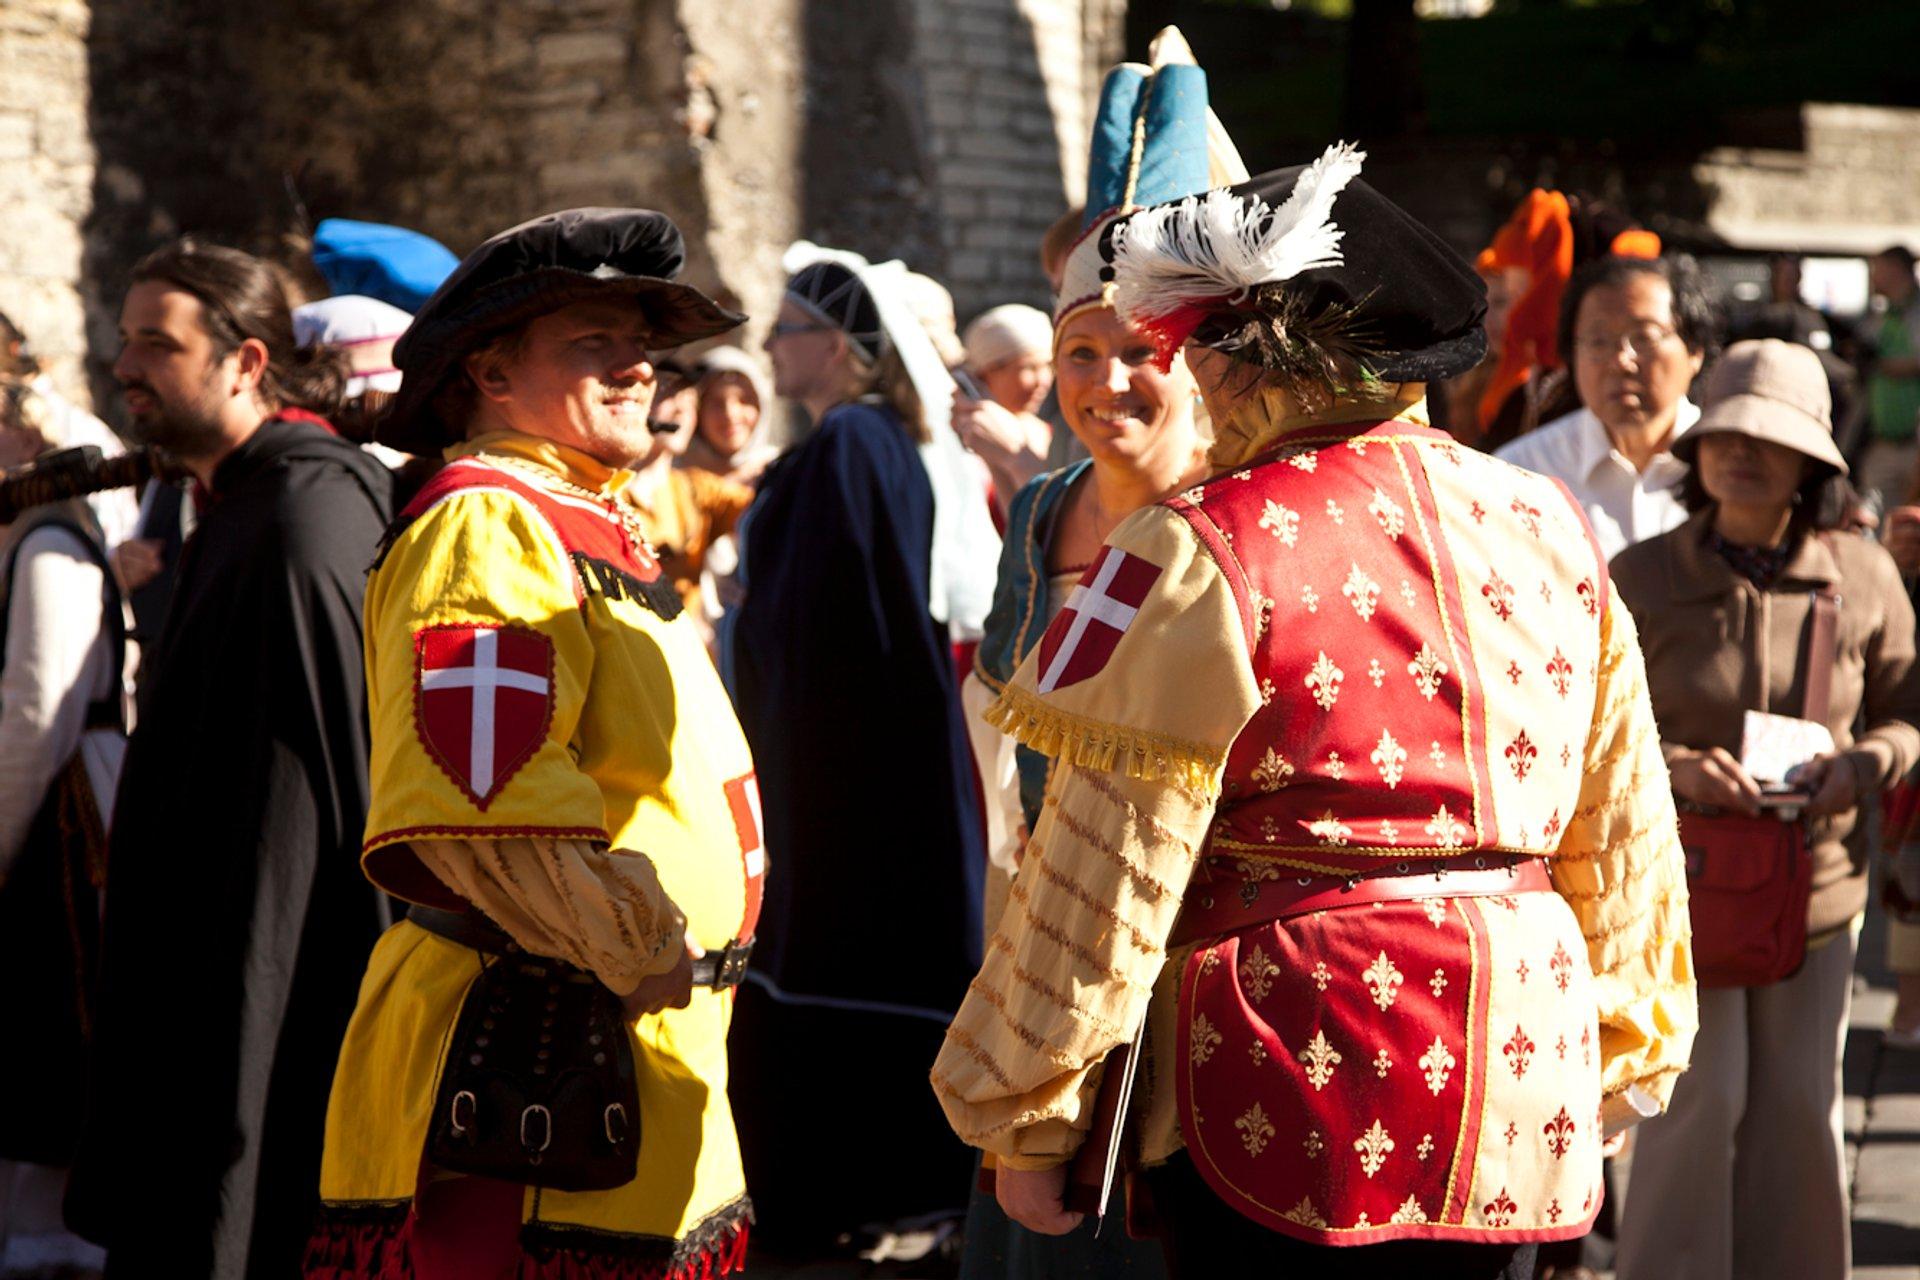 Tallinn Medieval Days in Estonia - Best Season 2020